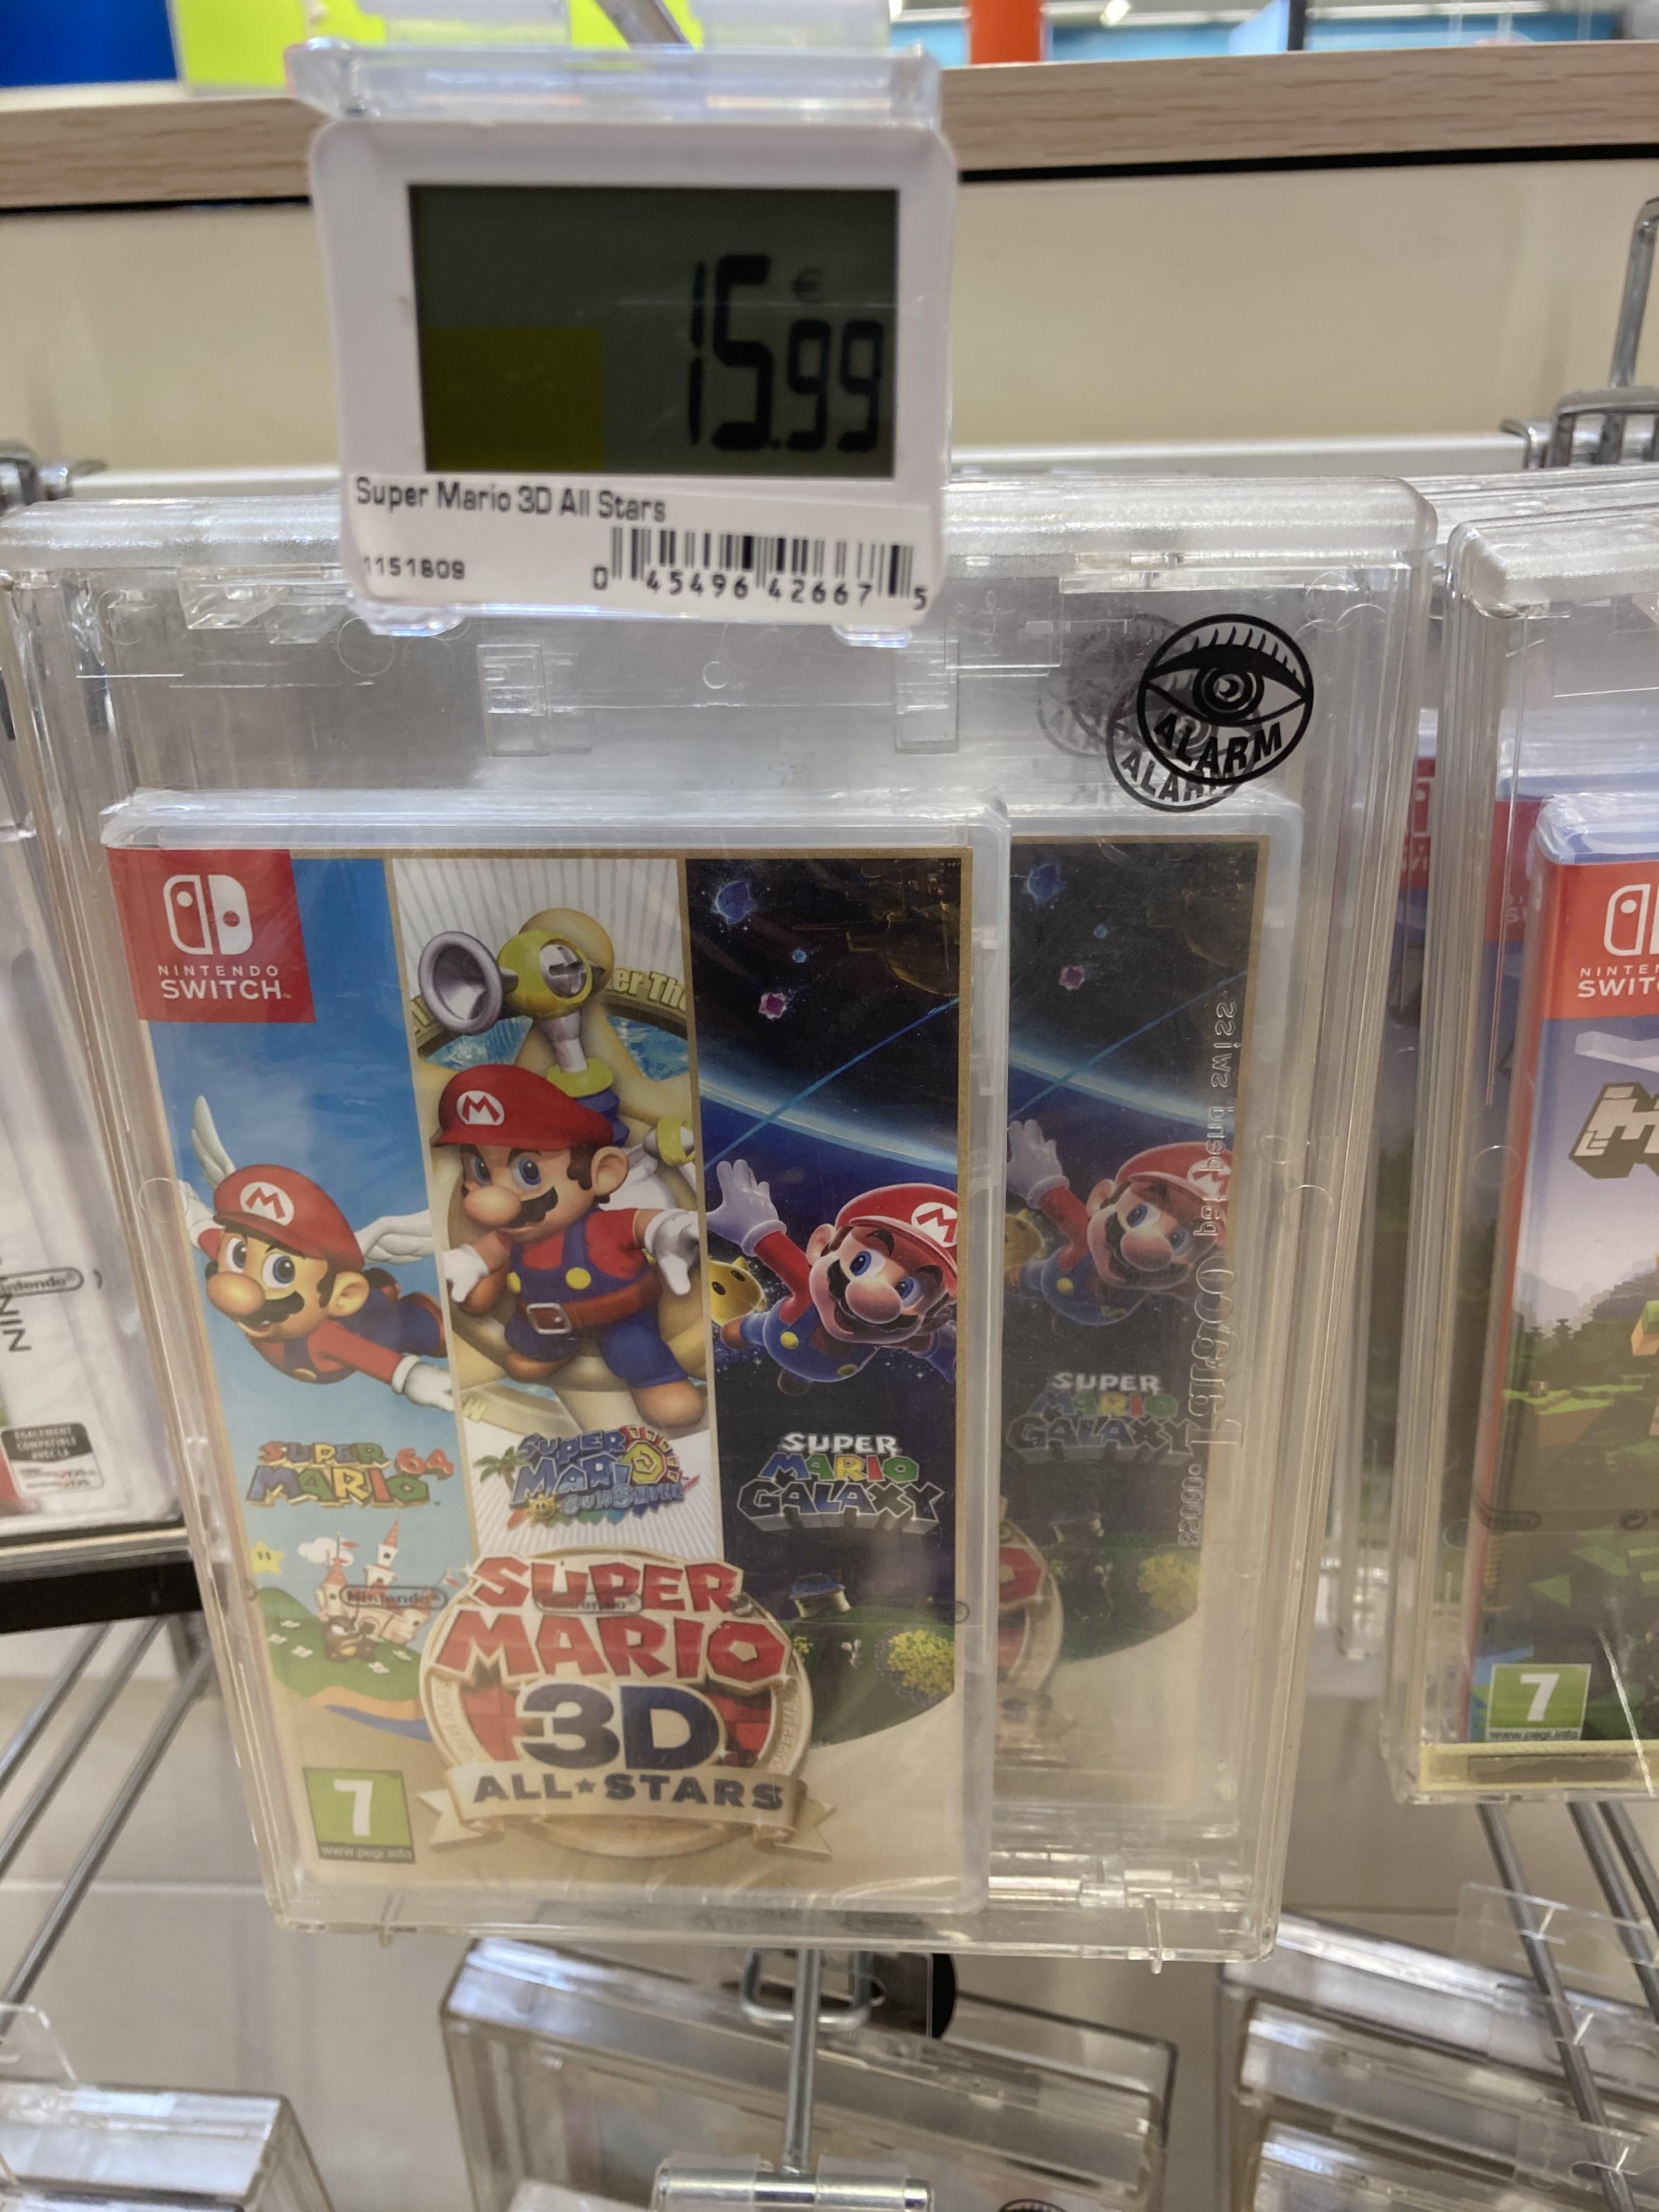 Super mario 3D aAll Star sur Nintendo Switch - Couzeix (87)